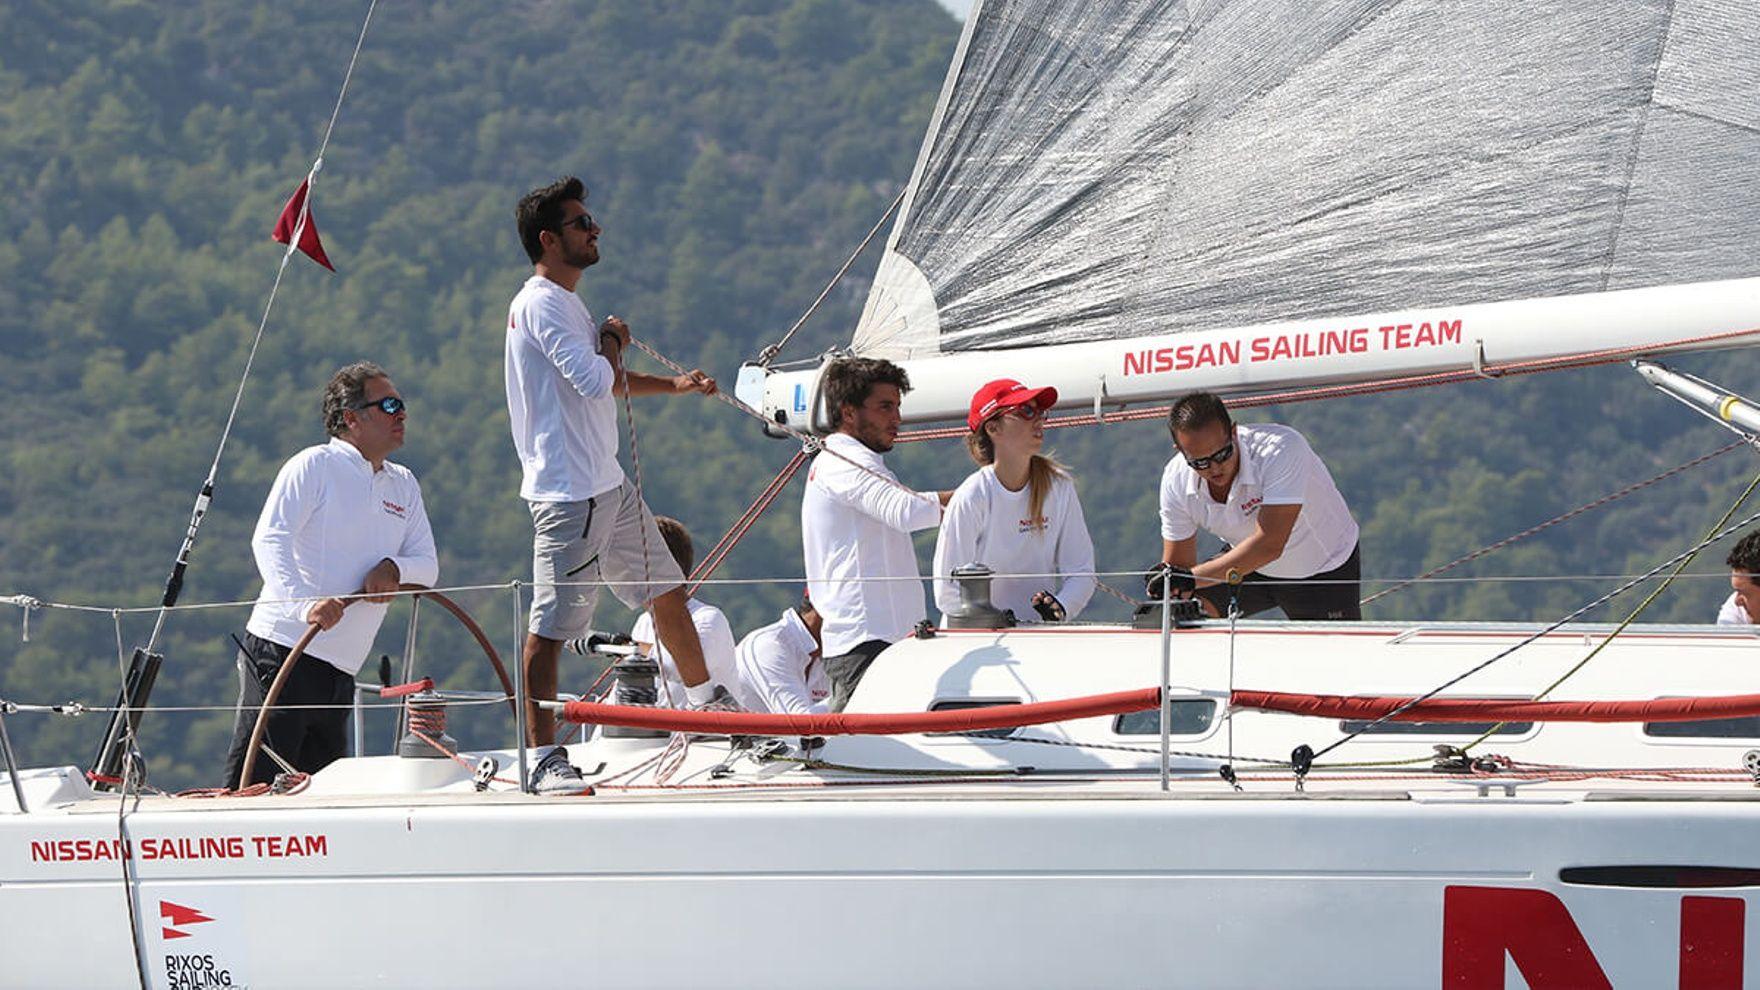 RIXOS SAILING CUP GÖCEK 2020